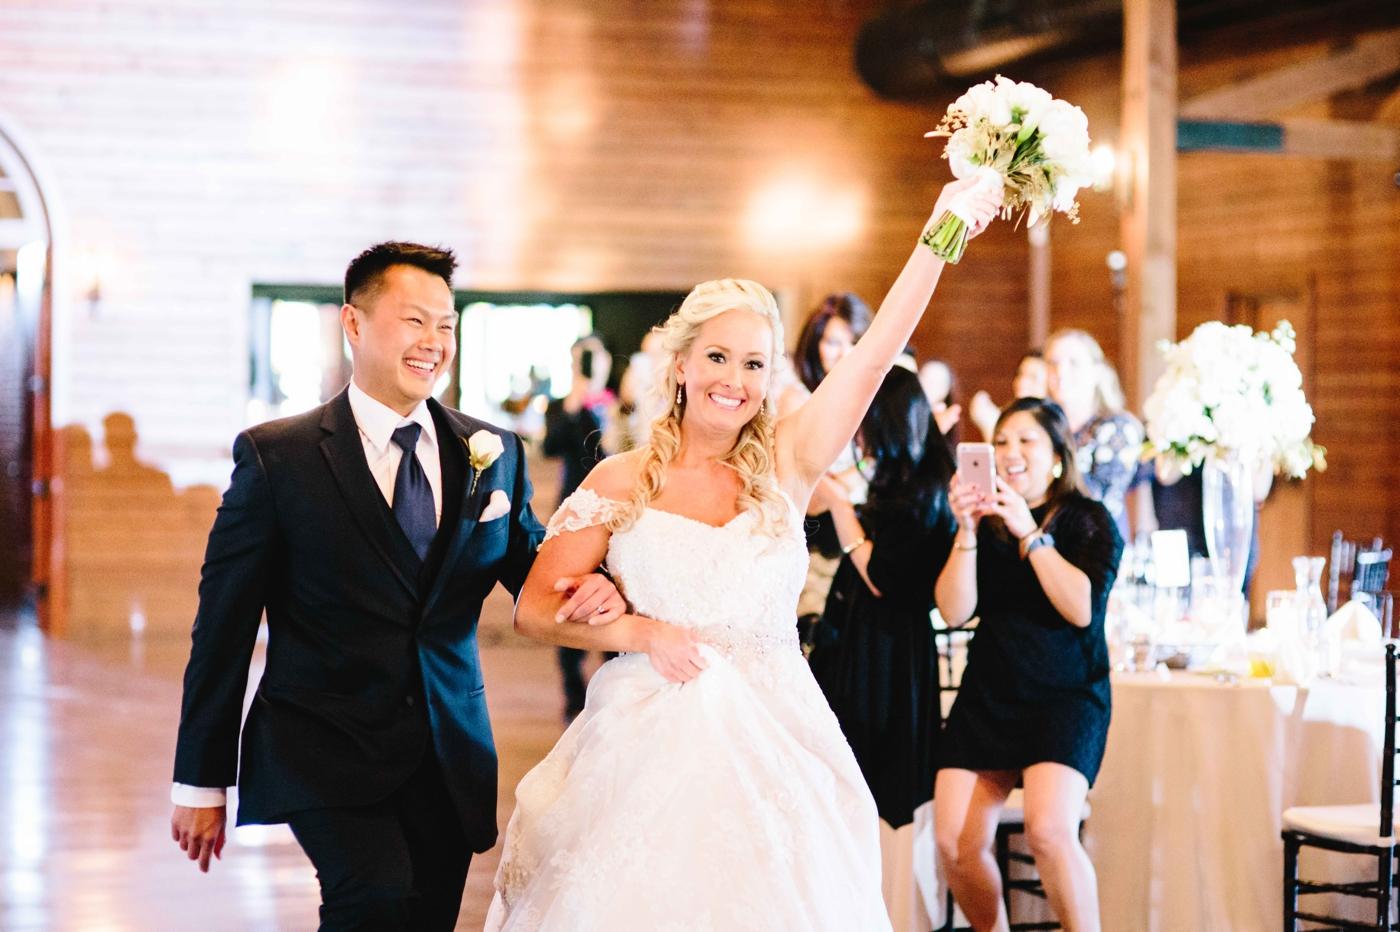 chicago-fine-art-wedding-photography-vo33